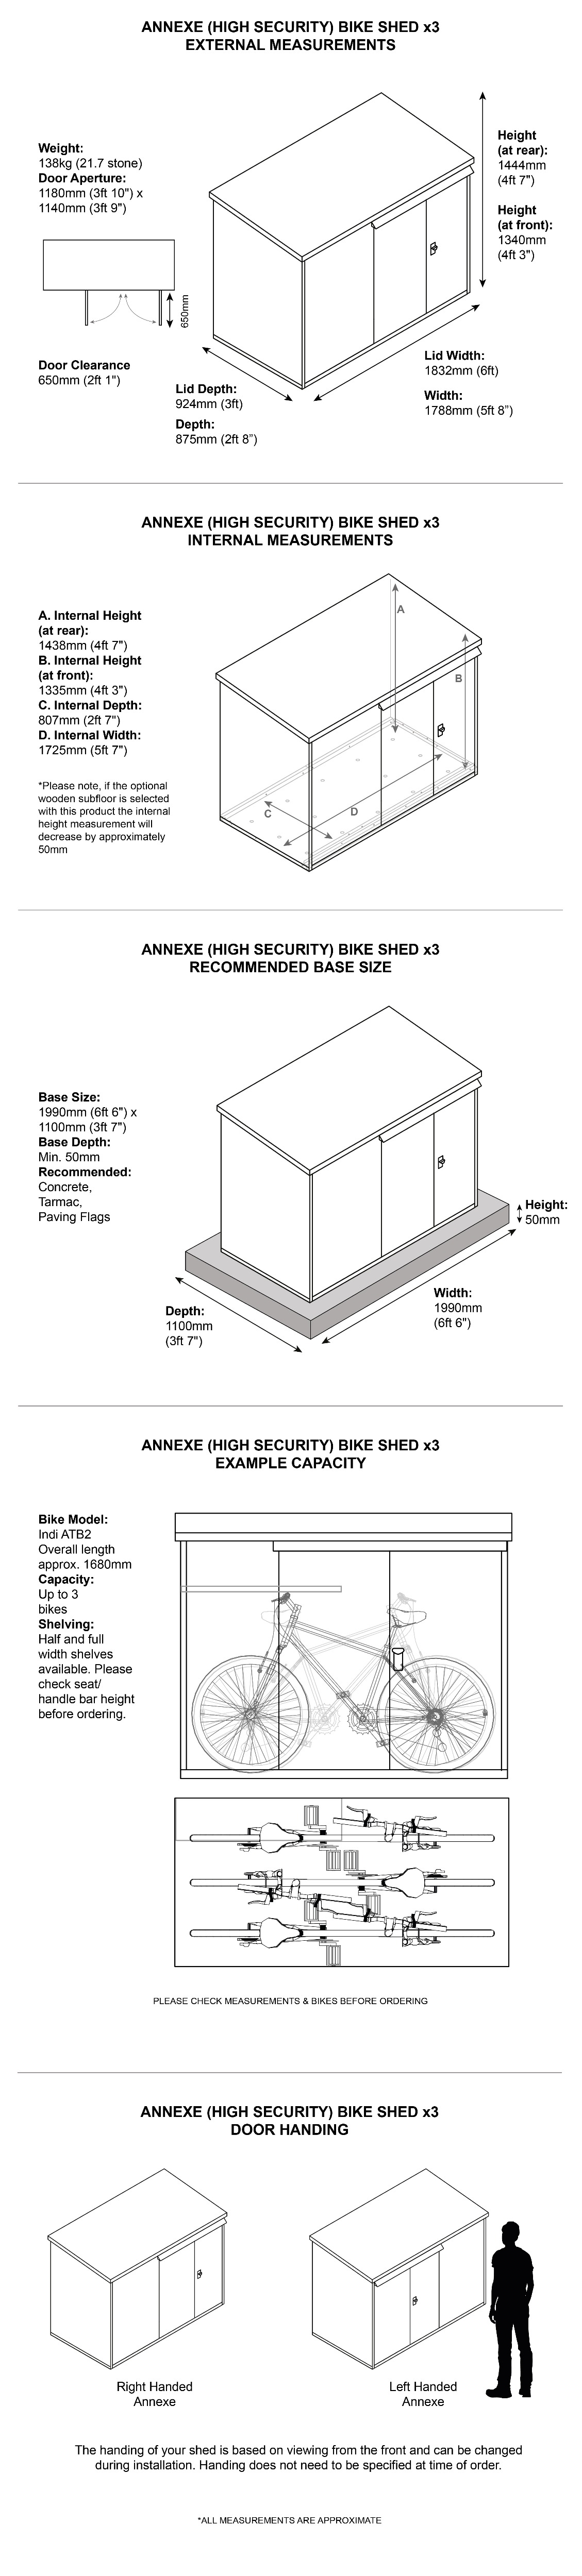 Asgard High Security Bike Storage Dimensions